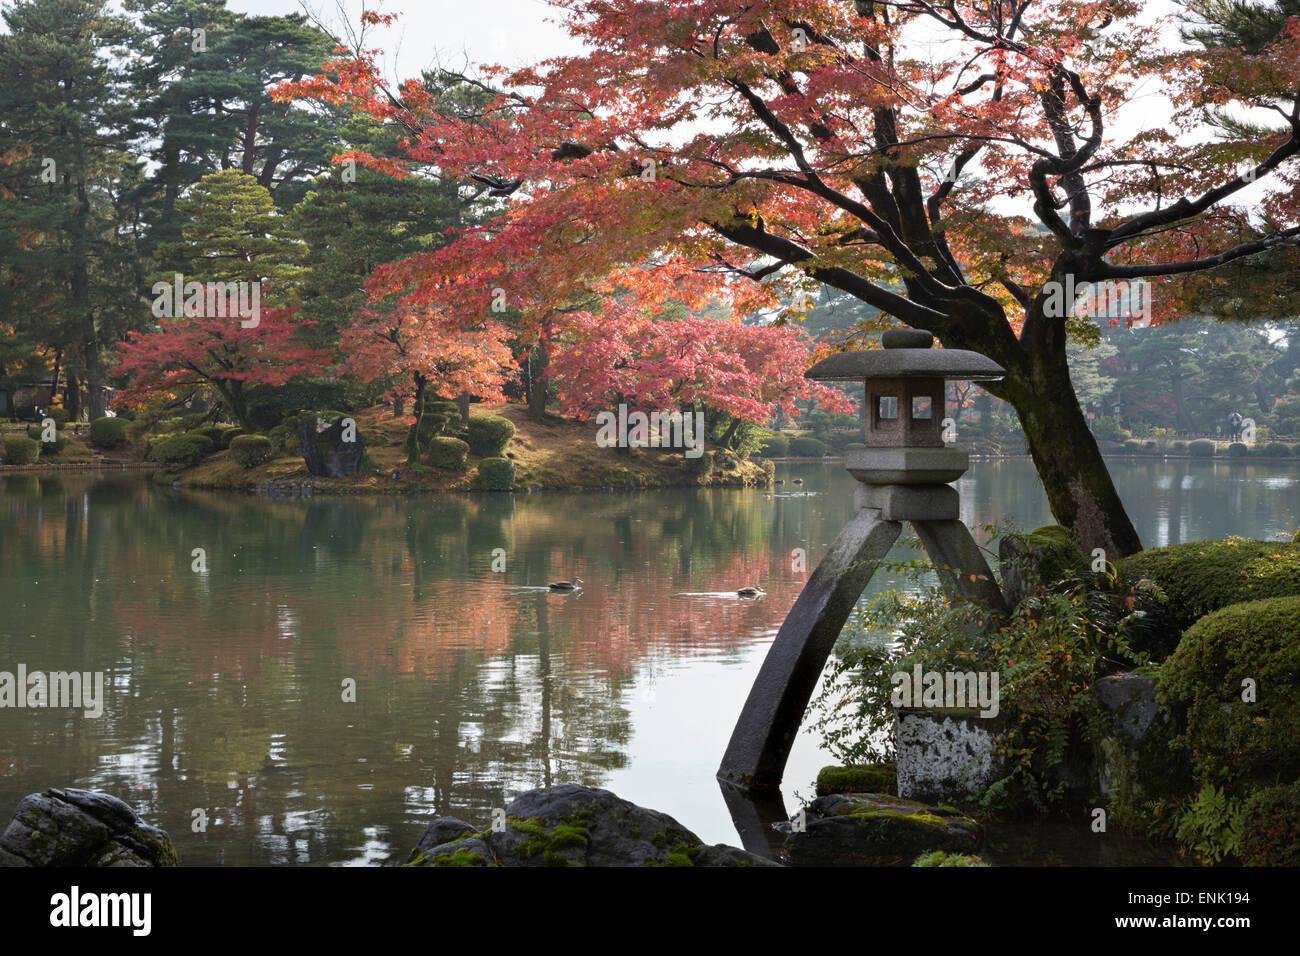 Kenrokuen Garten mit Kotojitoro Laterne im Herbst, Kanazawa, Präfektur Ishikawa, zentralen Honshu, Japan, Asien Stockbild